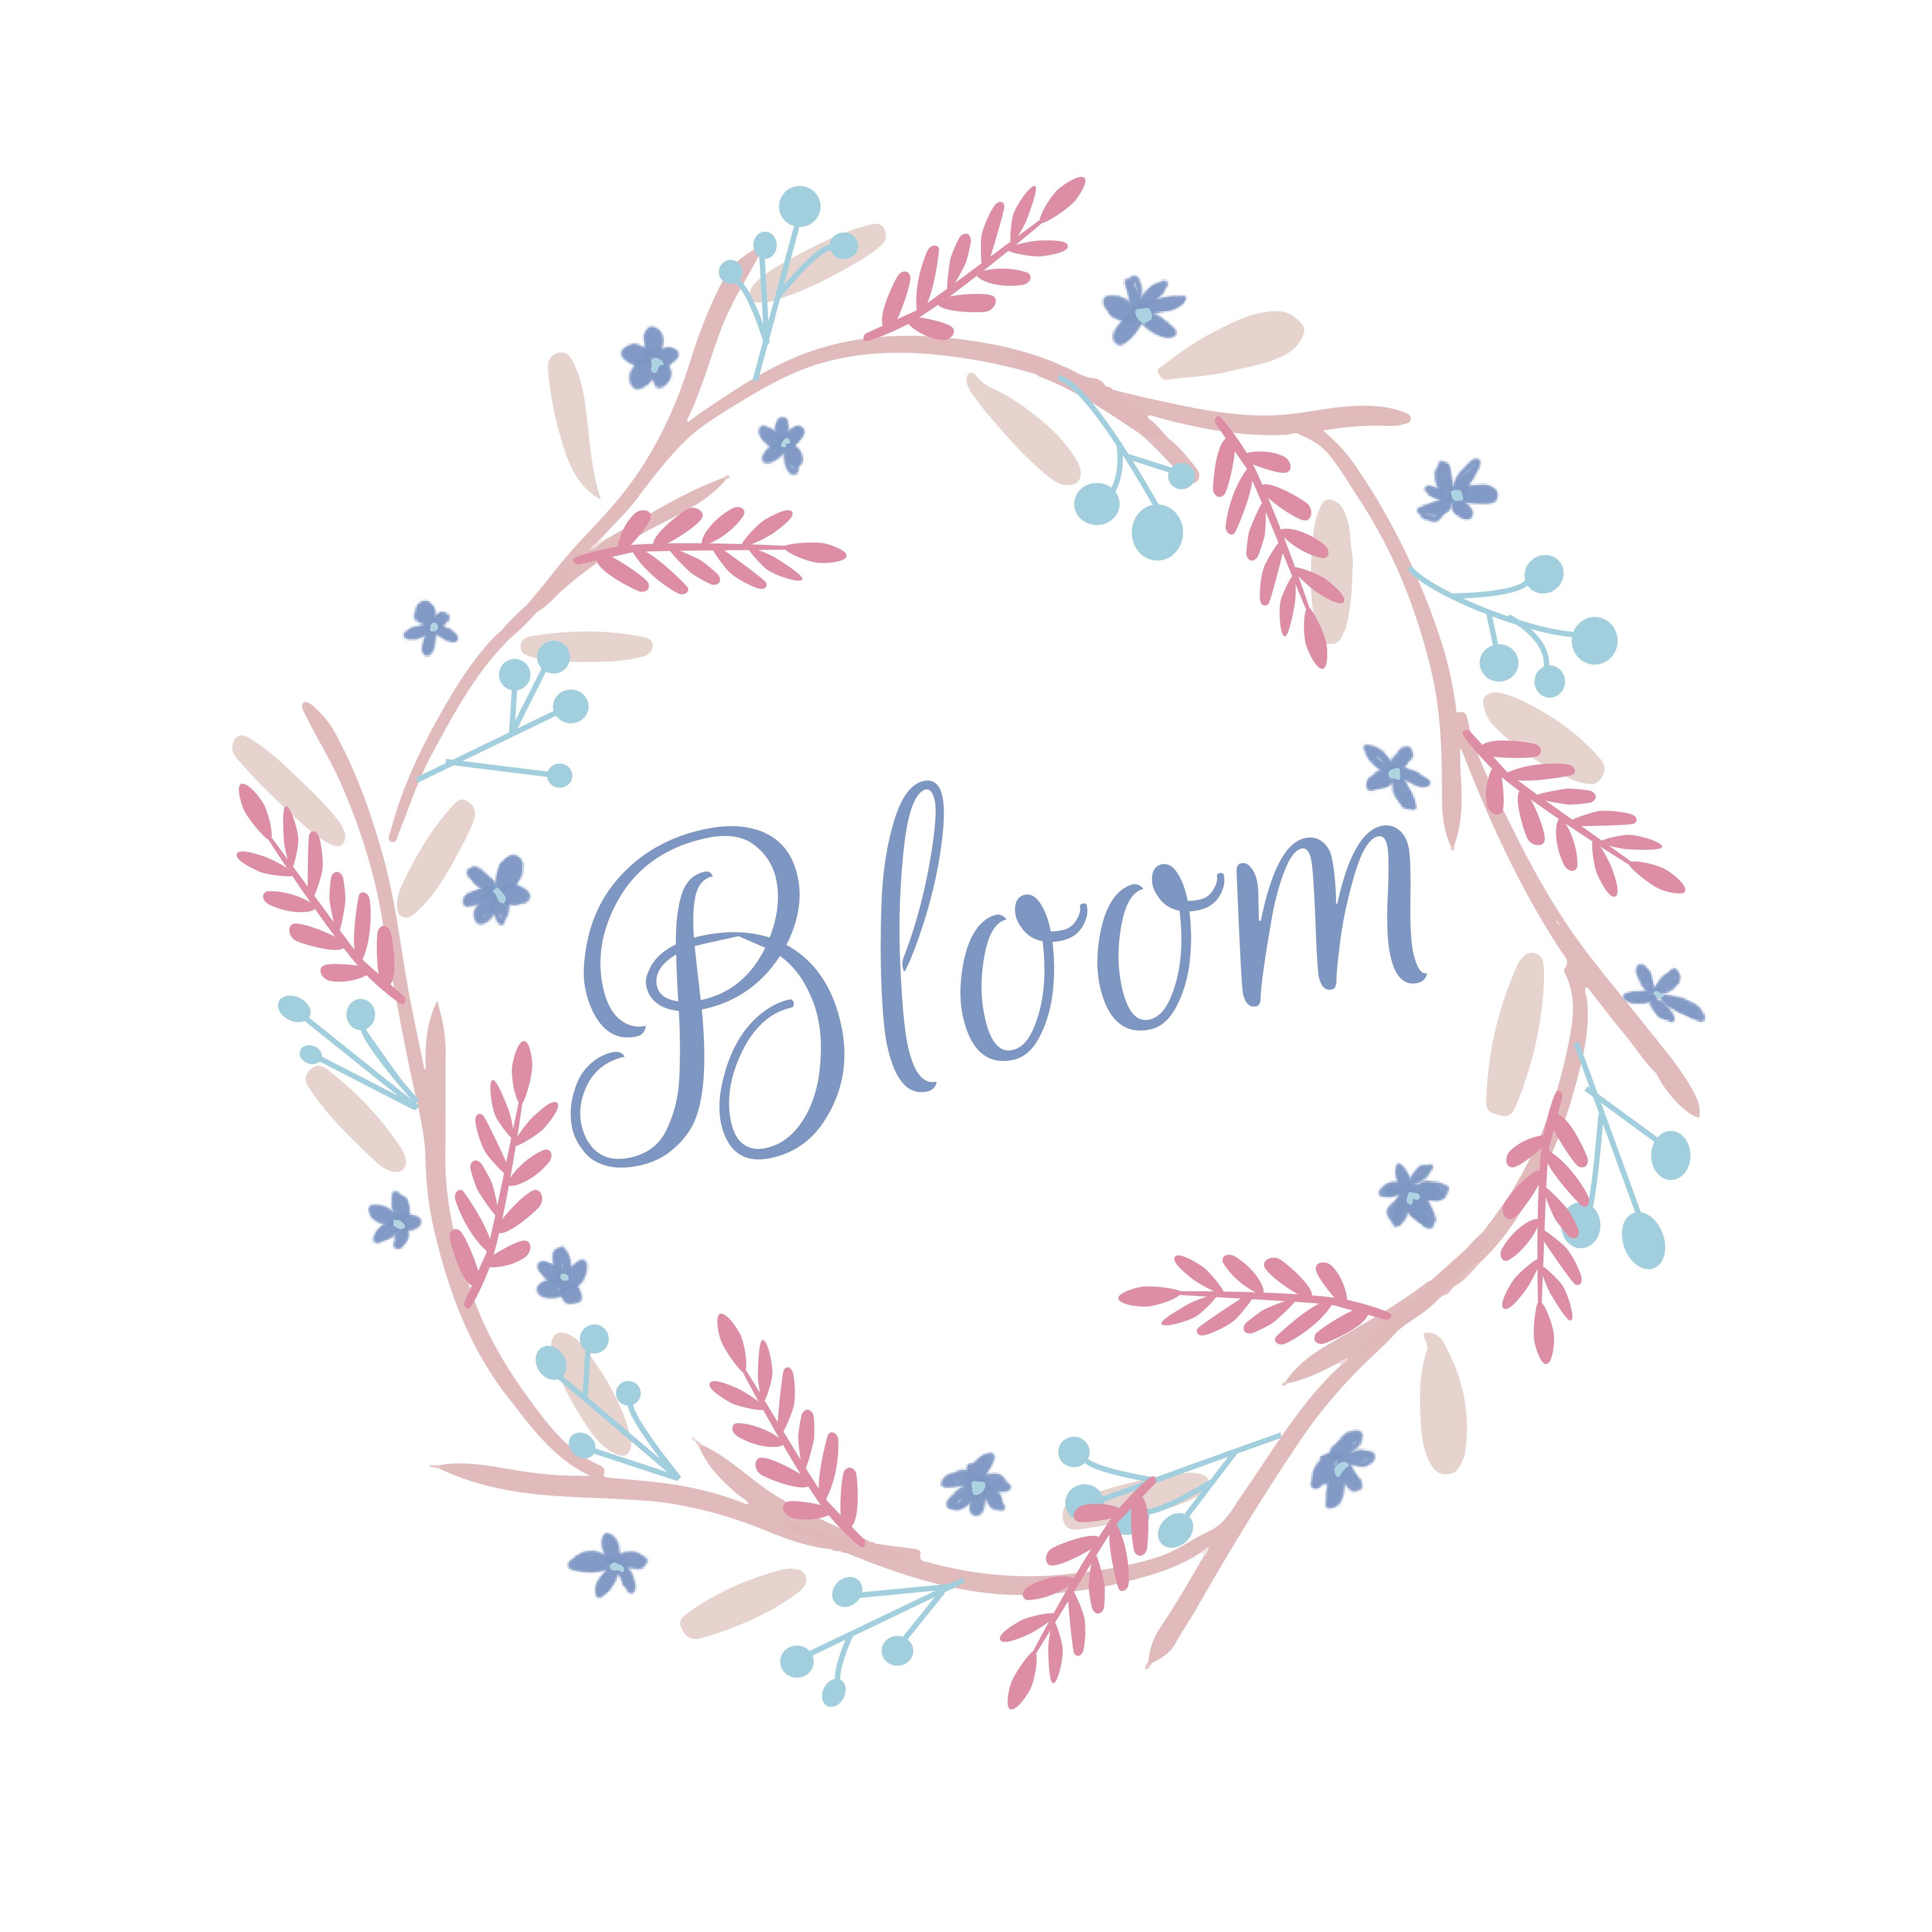 Photo of Bloom Wreath Illustration